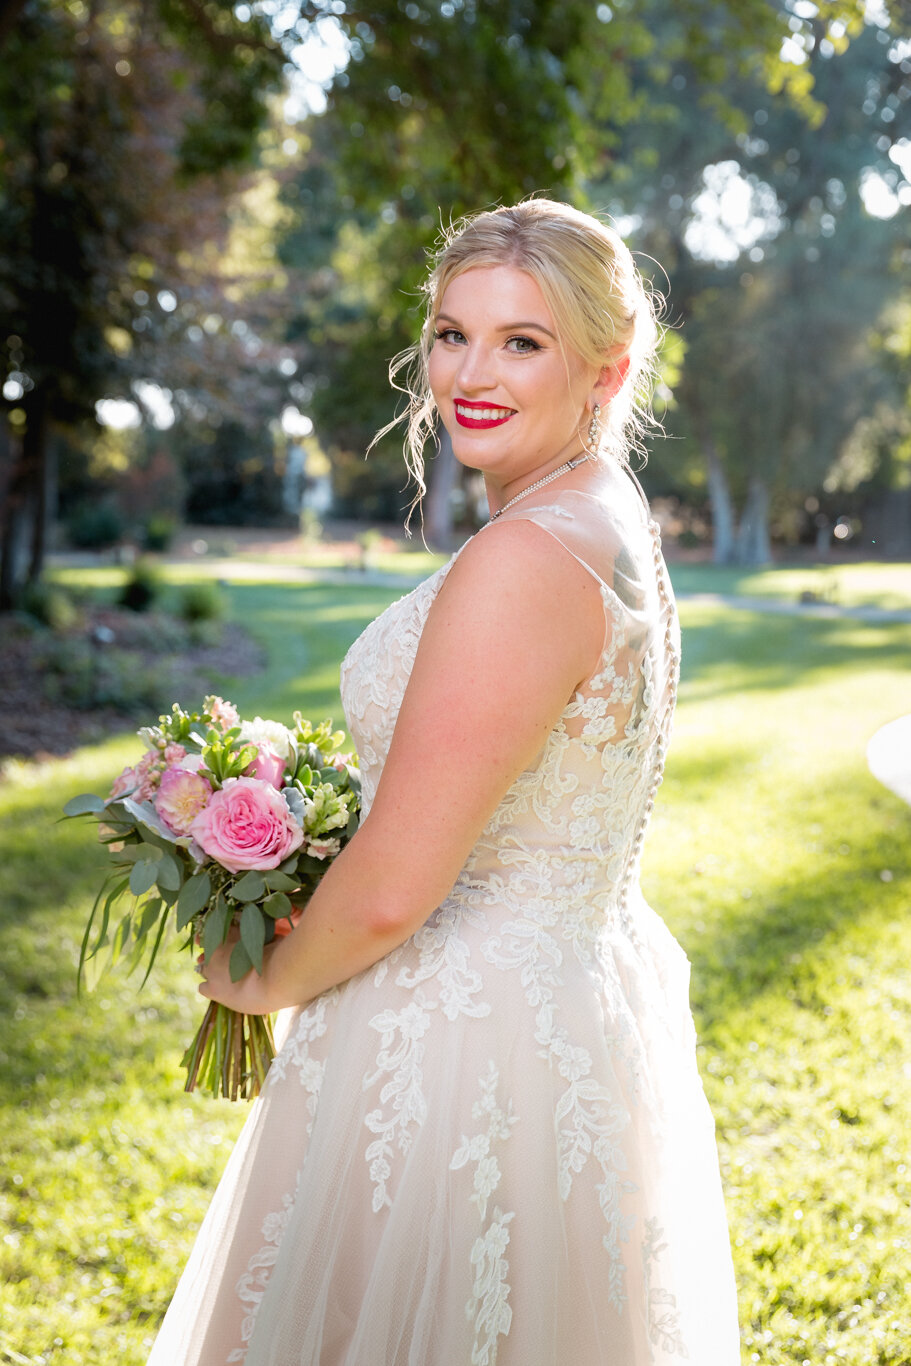 2019.08.24_Emily-Ashir-Wedding-at-the-Maples-6100.jpg